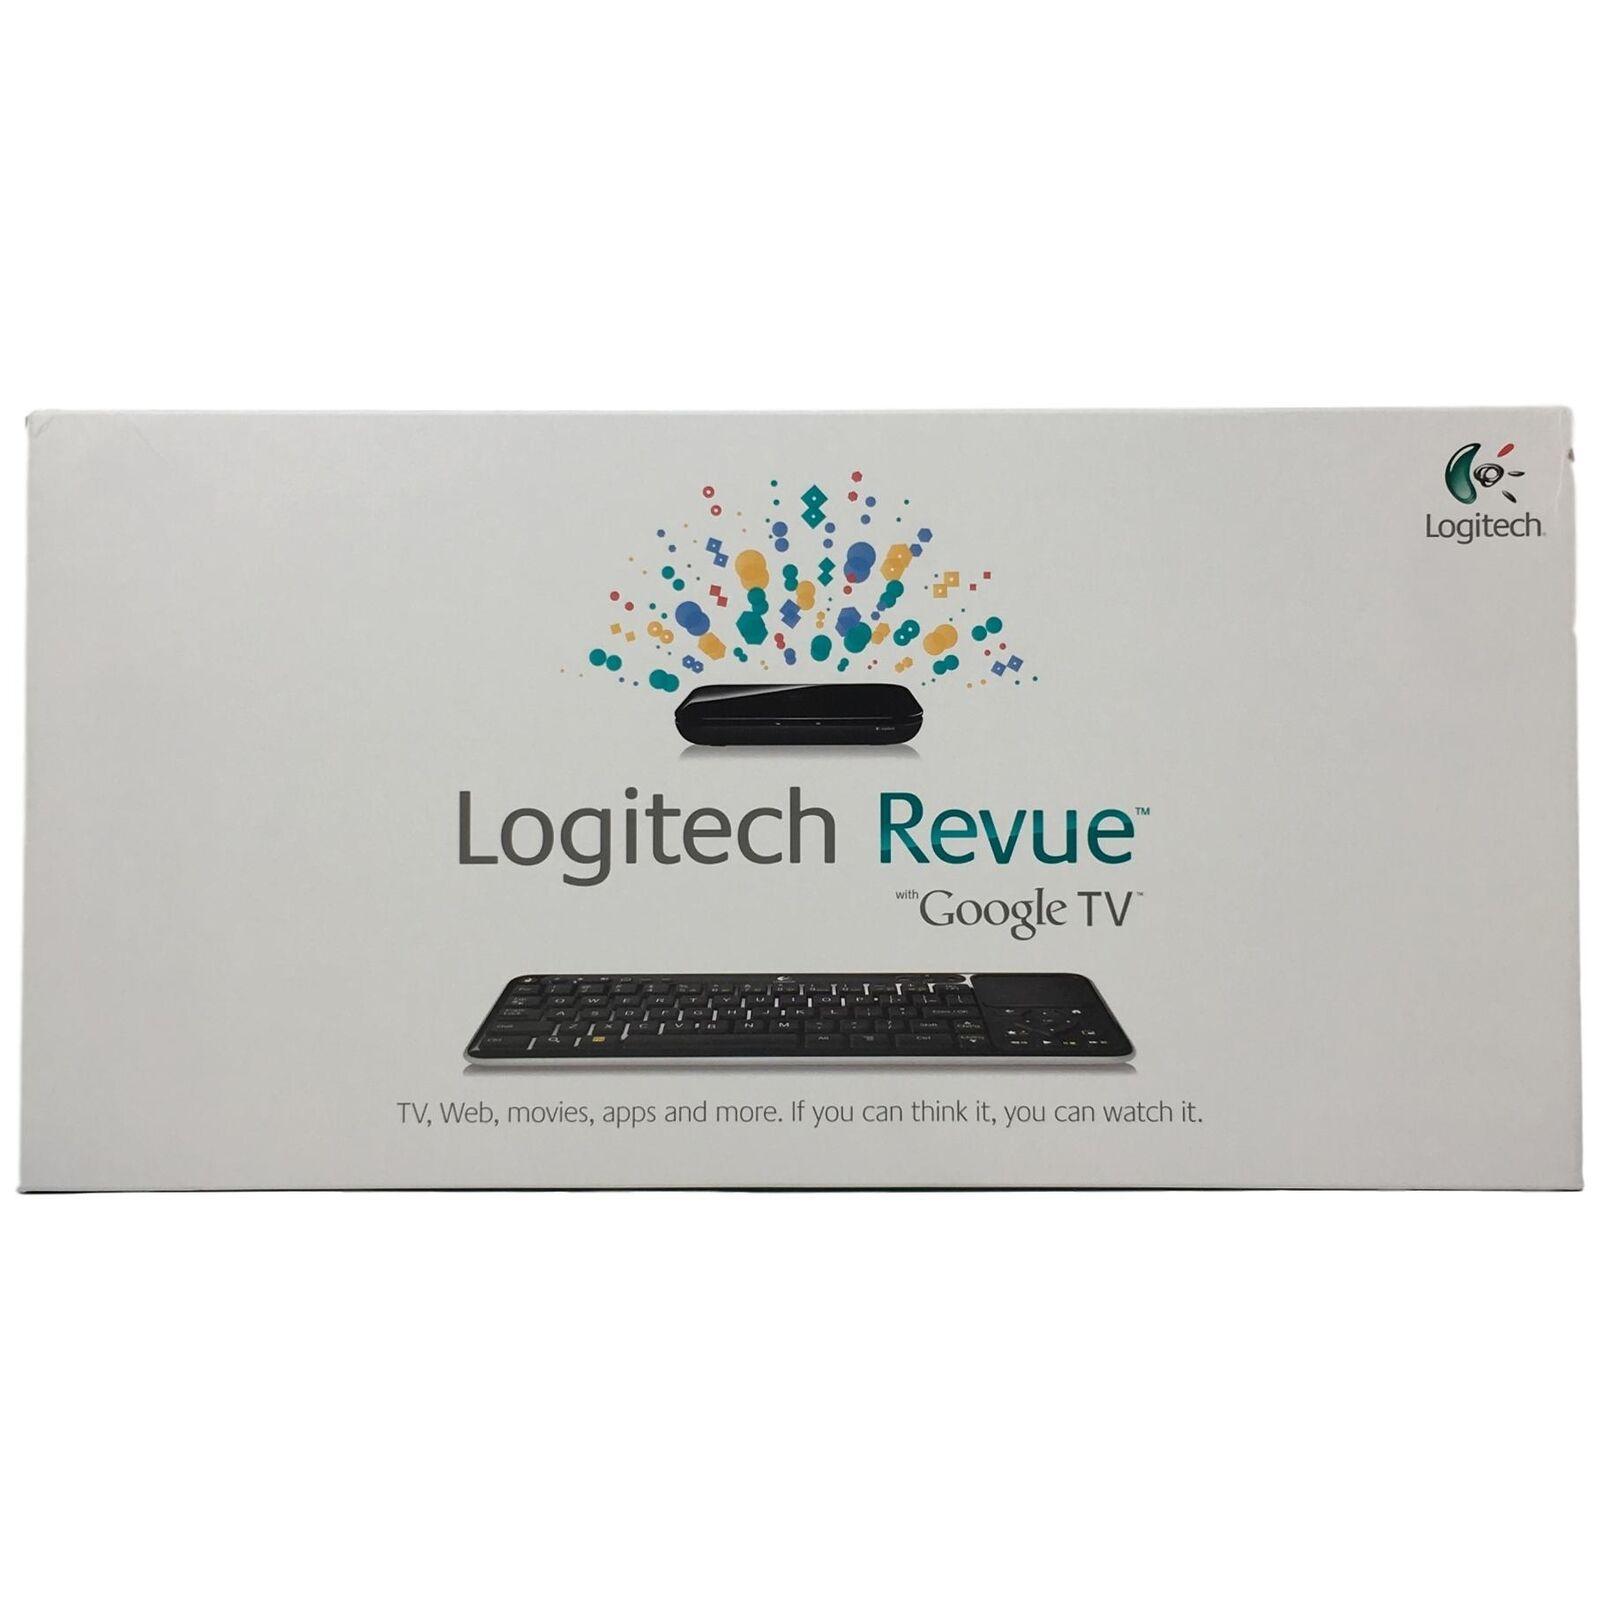 Logitech Revue Digital HD Google TV Media Player Streamer Keyboard Controller Featured